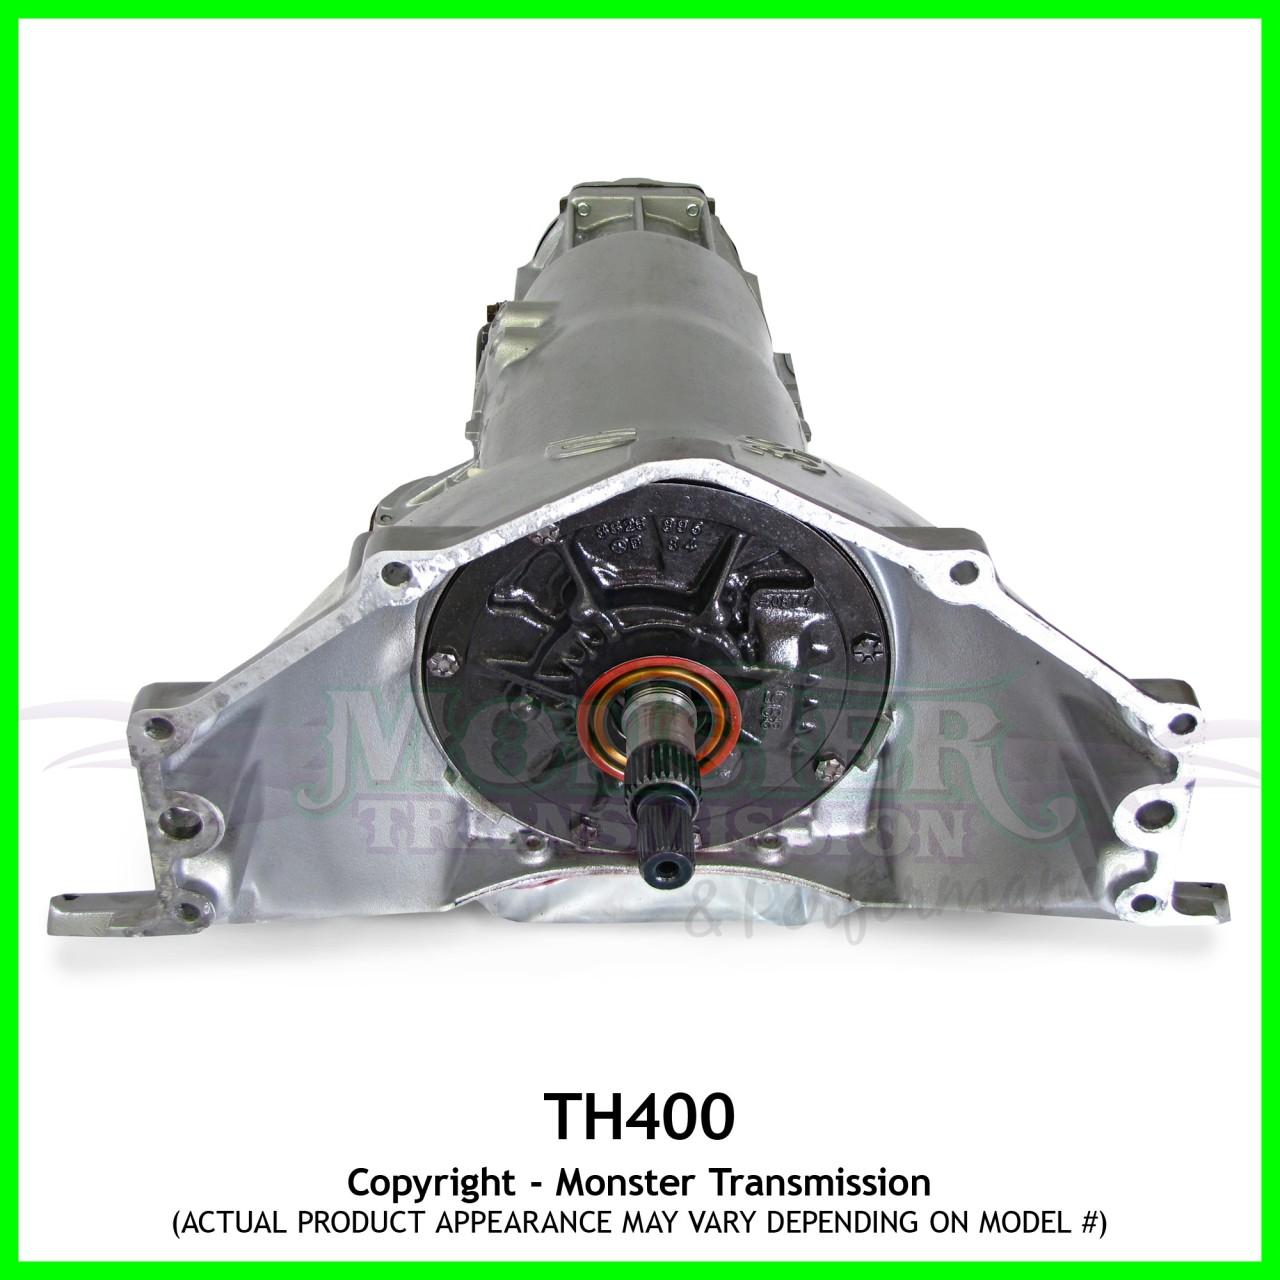 Turbo 400 Th400 Transmission Heavy Duty Performance 4